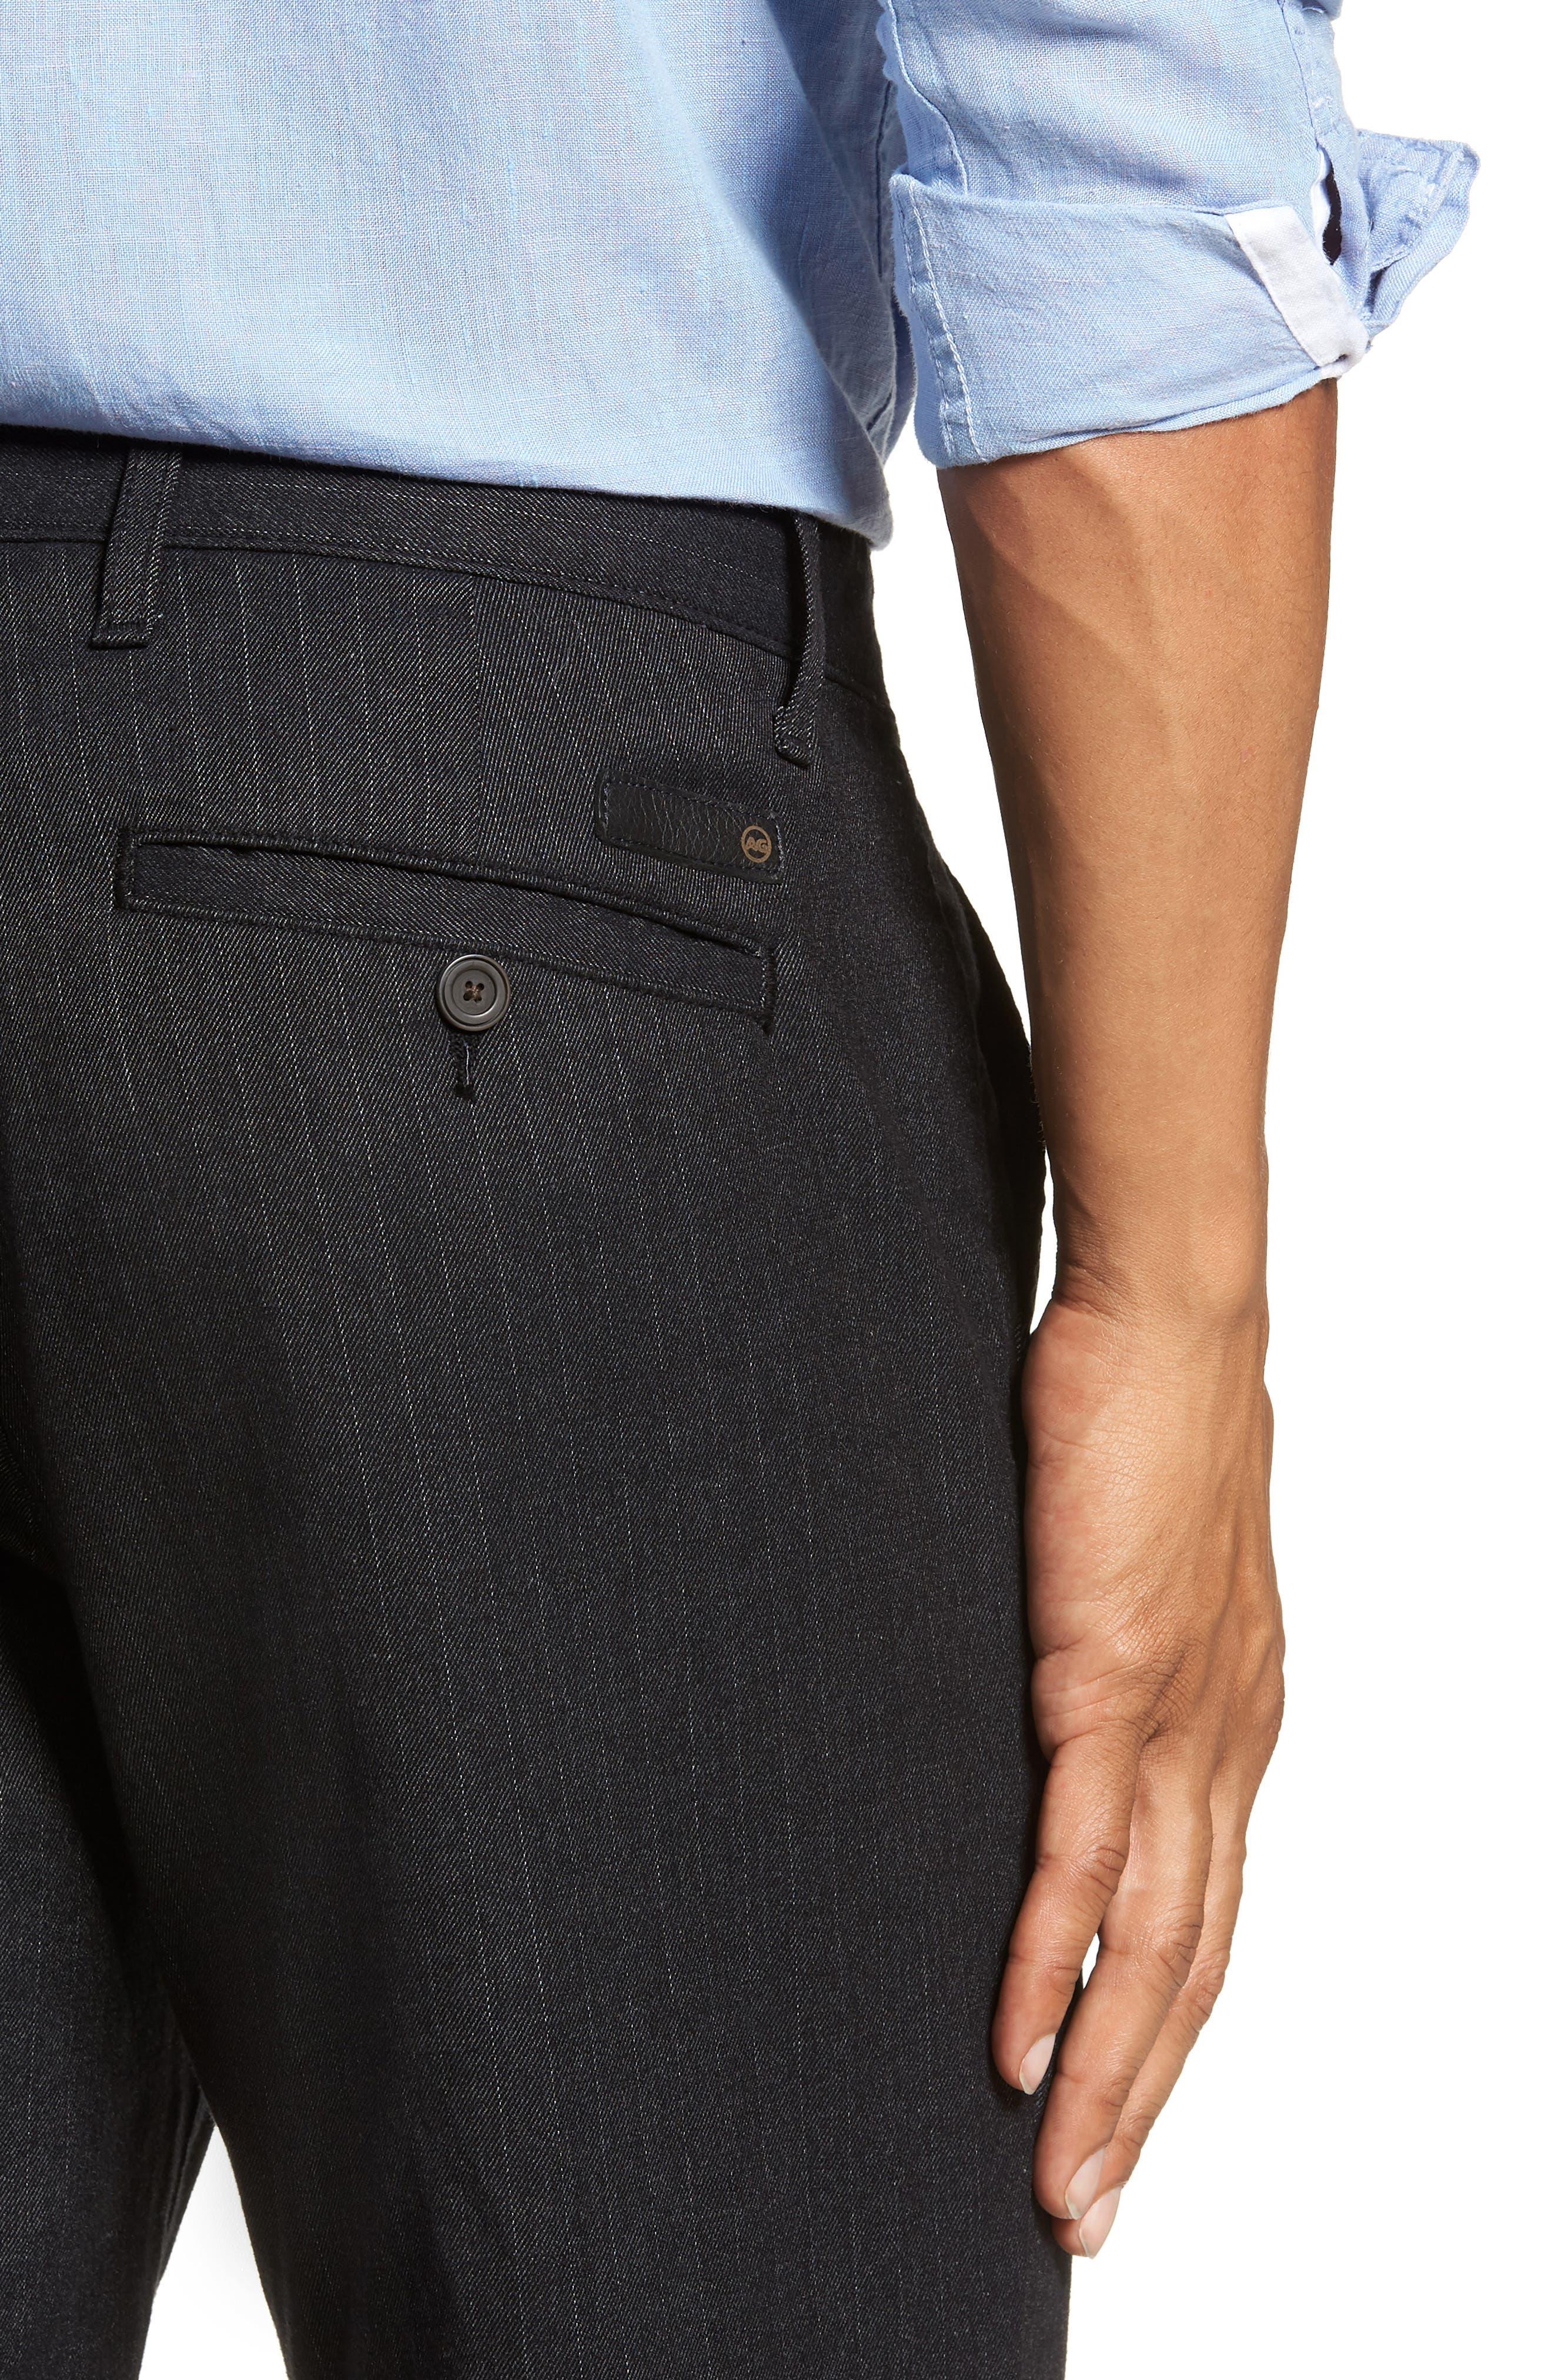 Marshall Slim Fit Pinstripe Pants,                             Alternate thumbnail 4, color,                             HEATHERED MELANGE BLACK